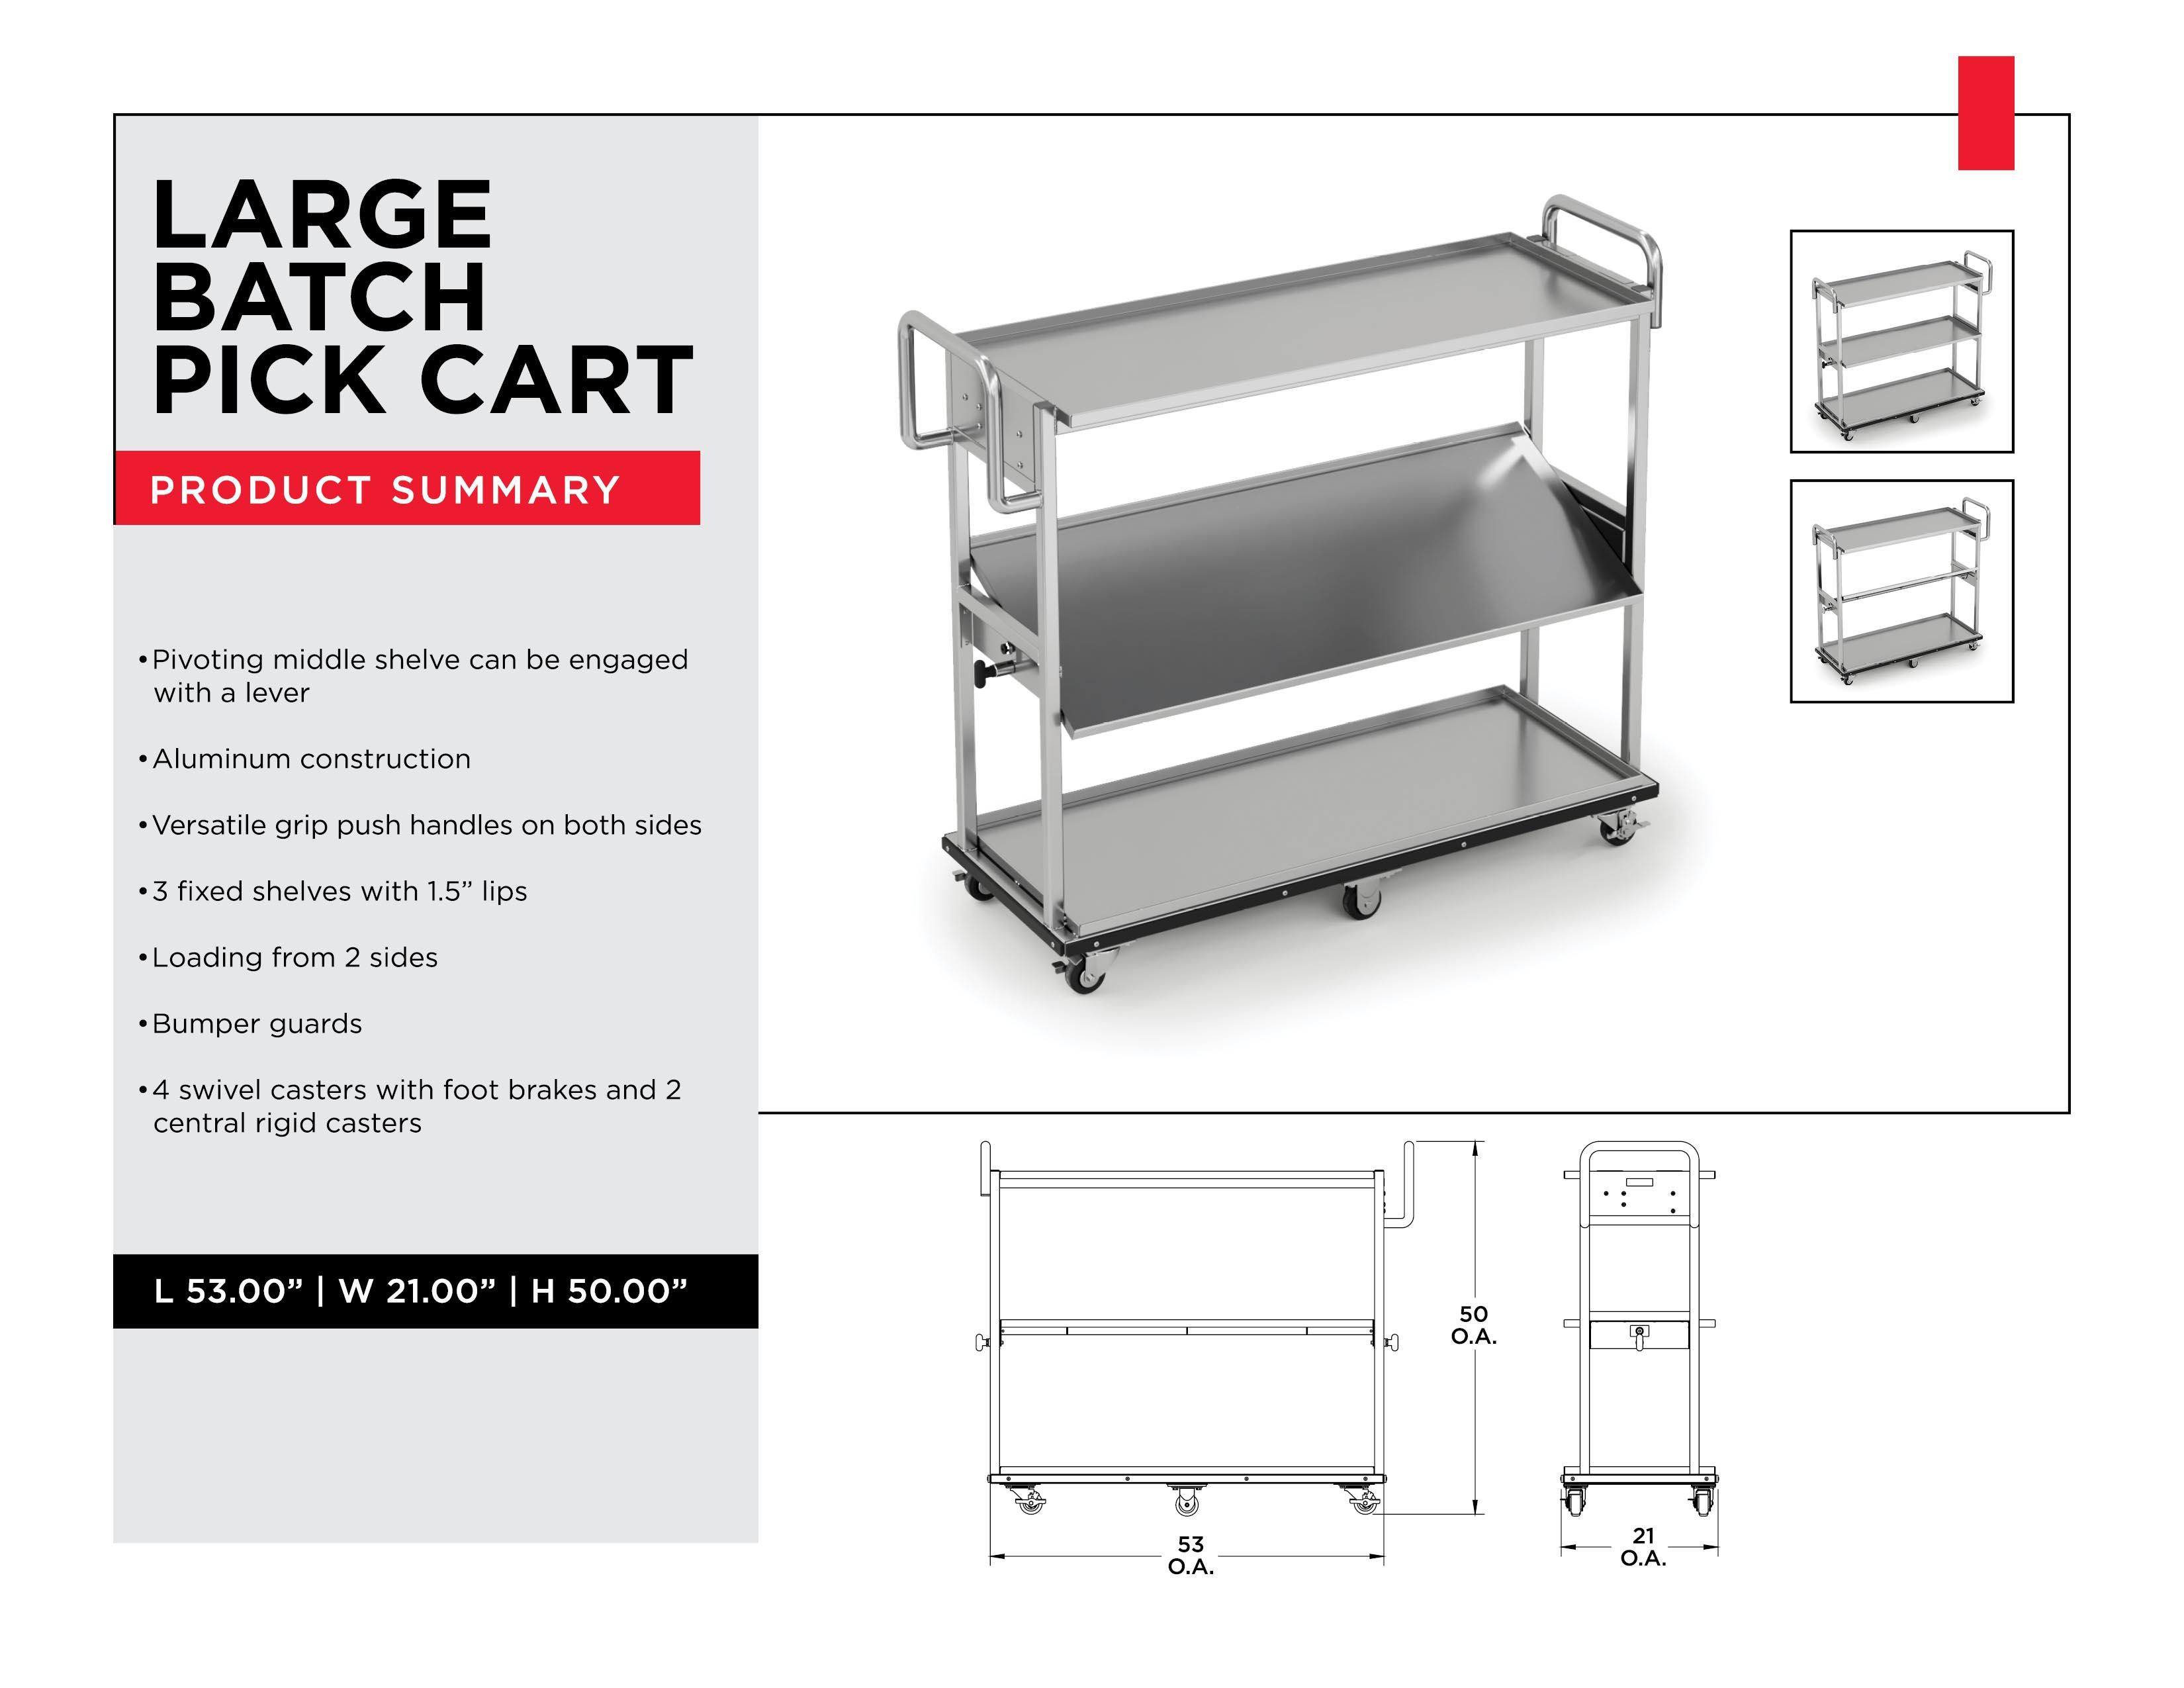 Retail Inventory Management: Large Batch Pick Cart